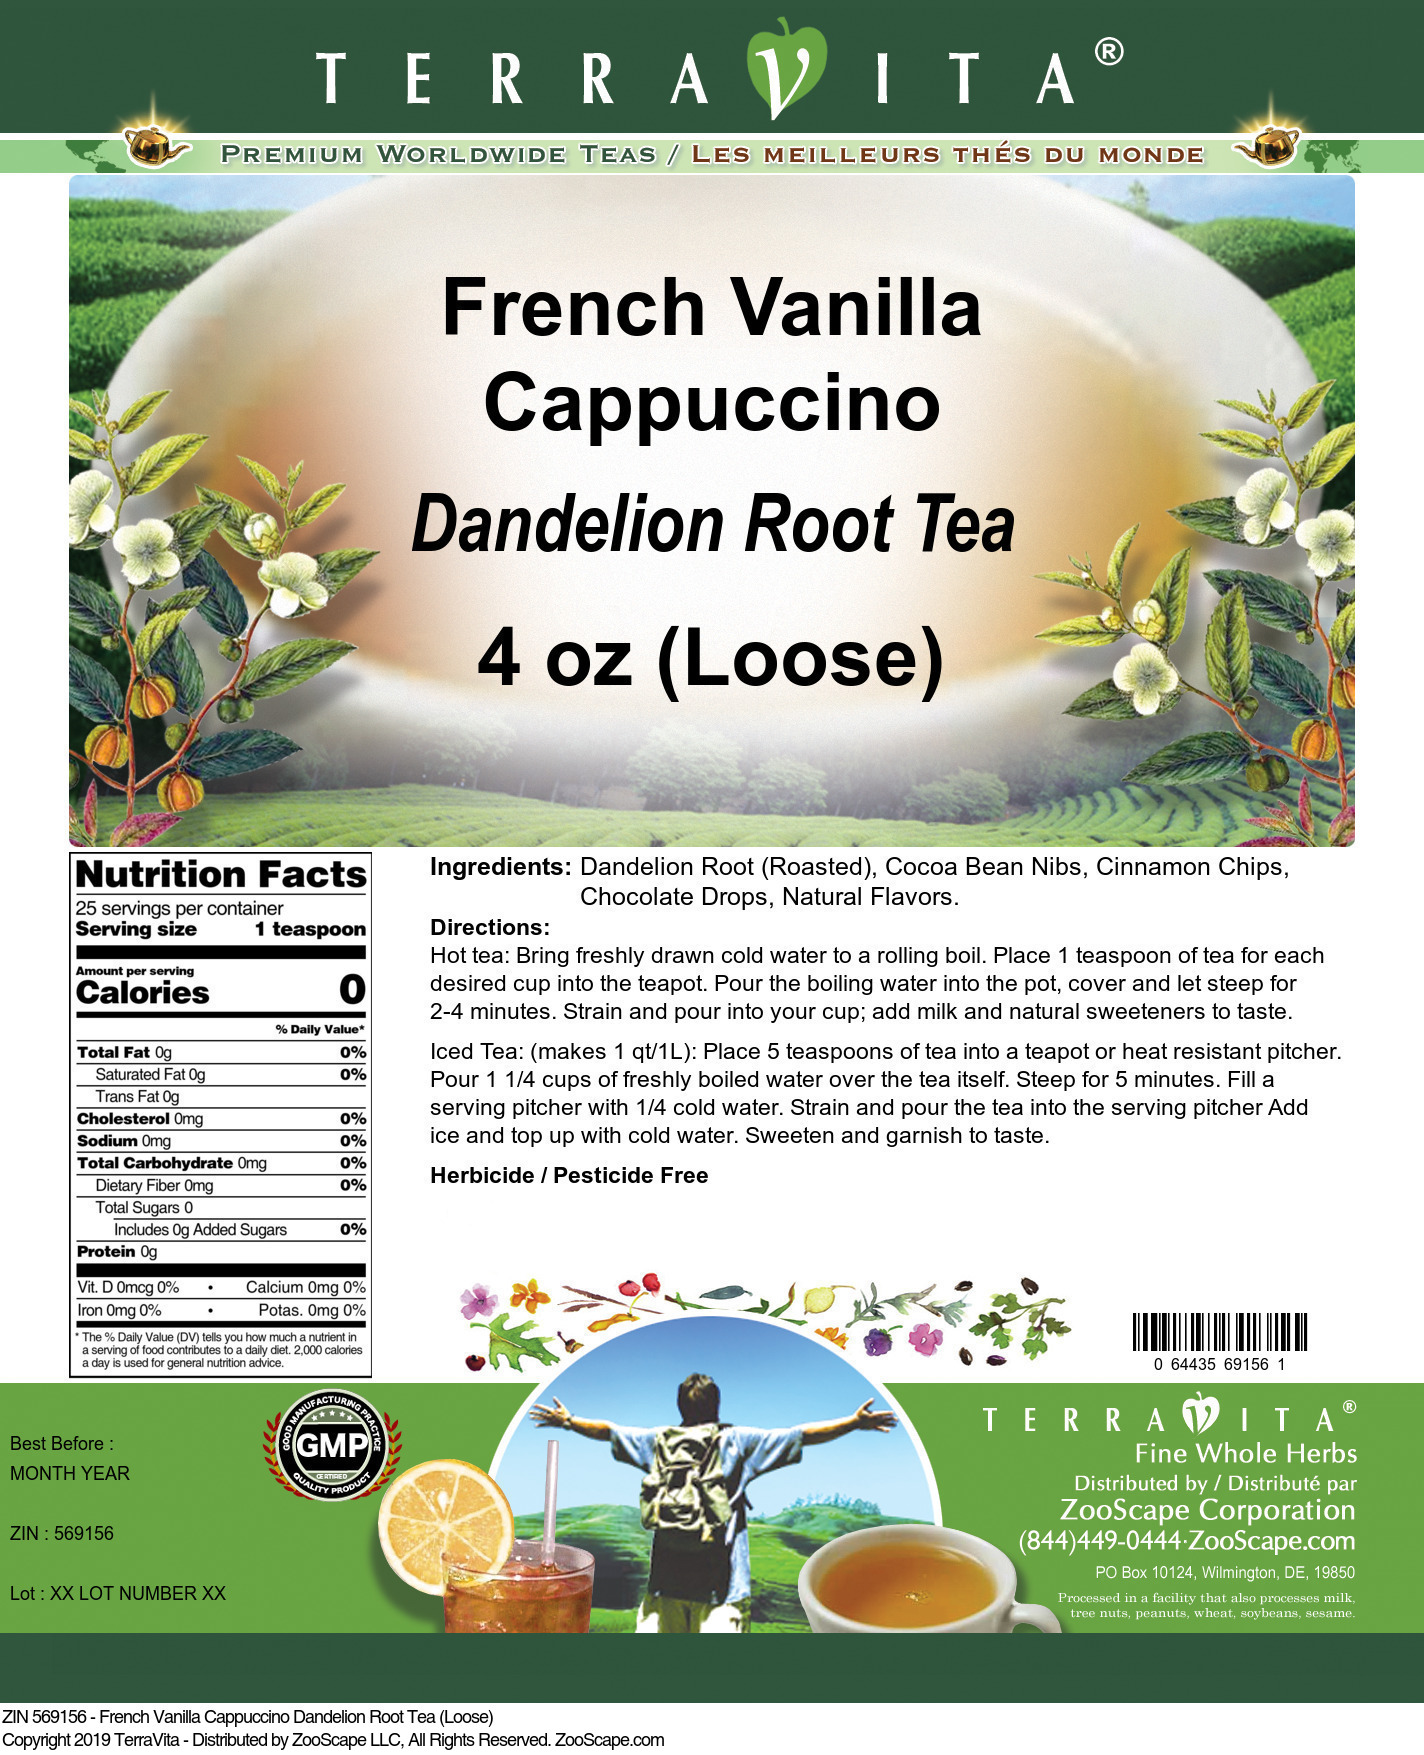 French Vanilla Cappuccino Dandelion Root